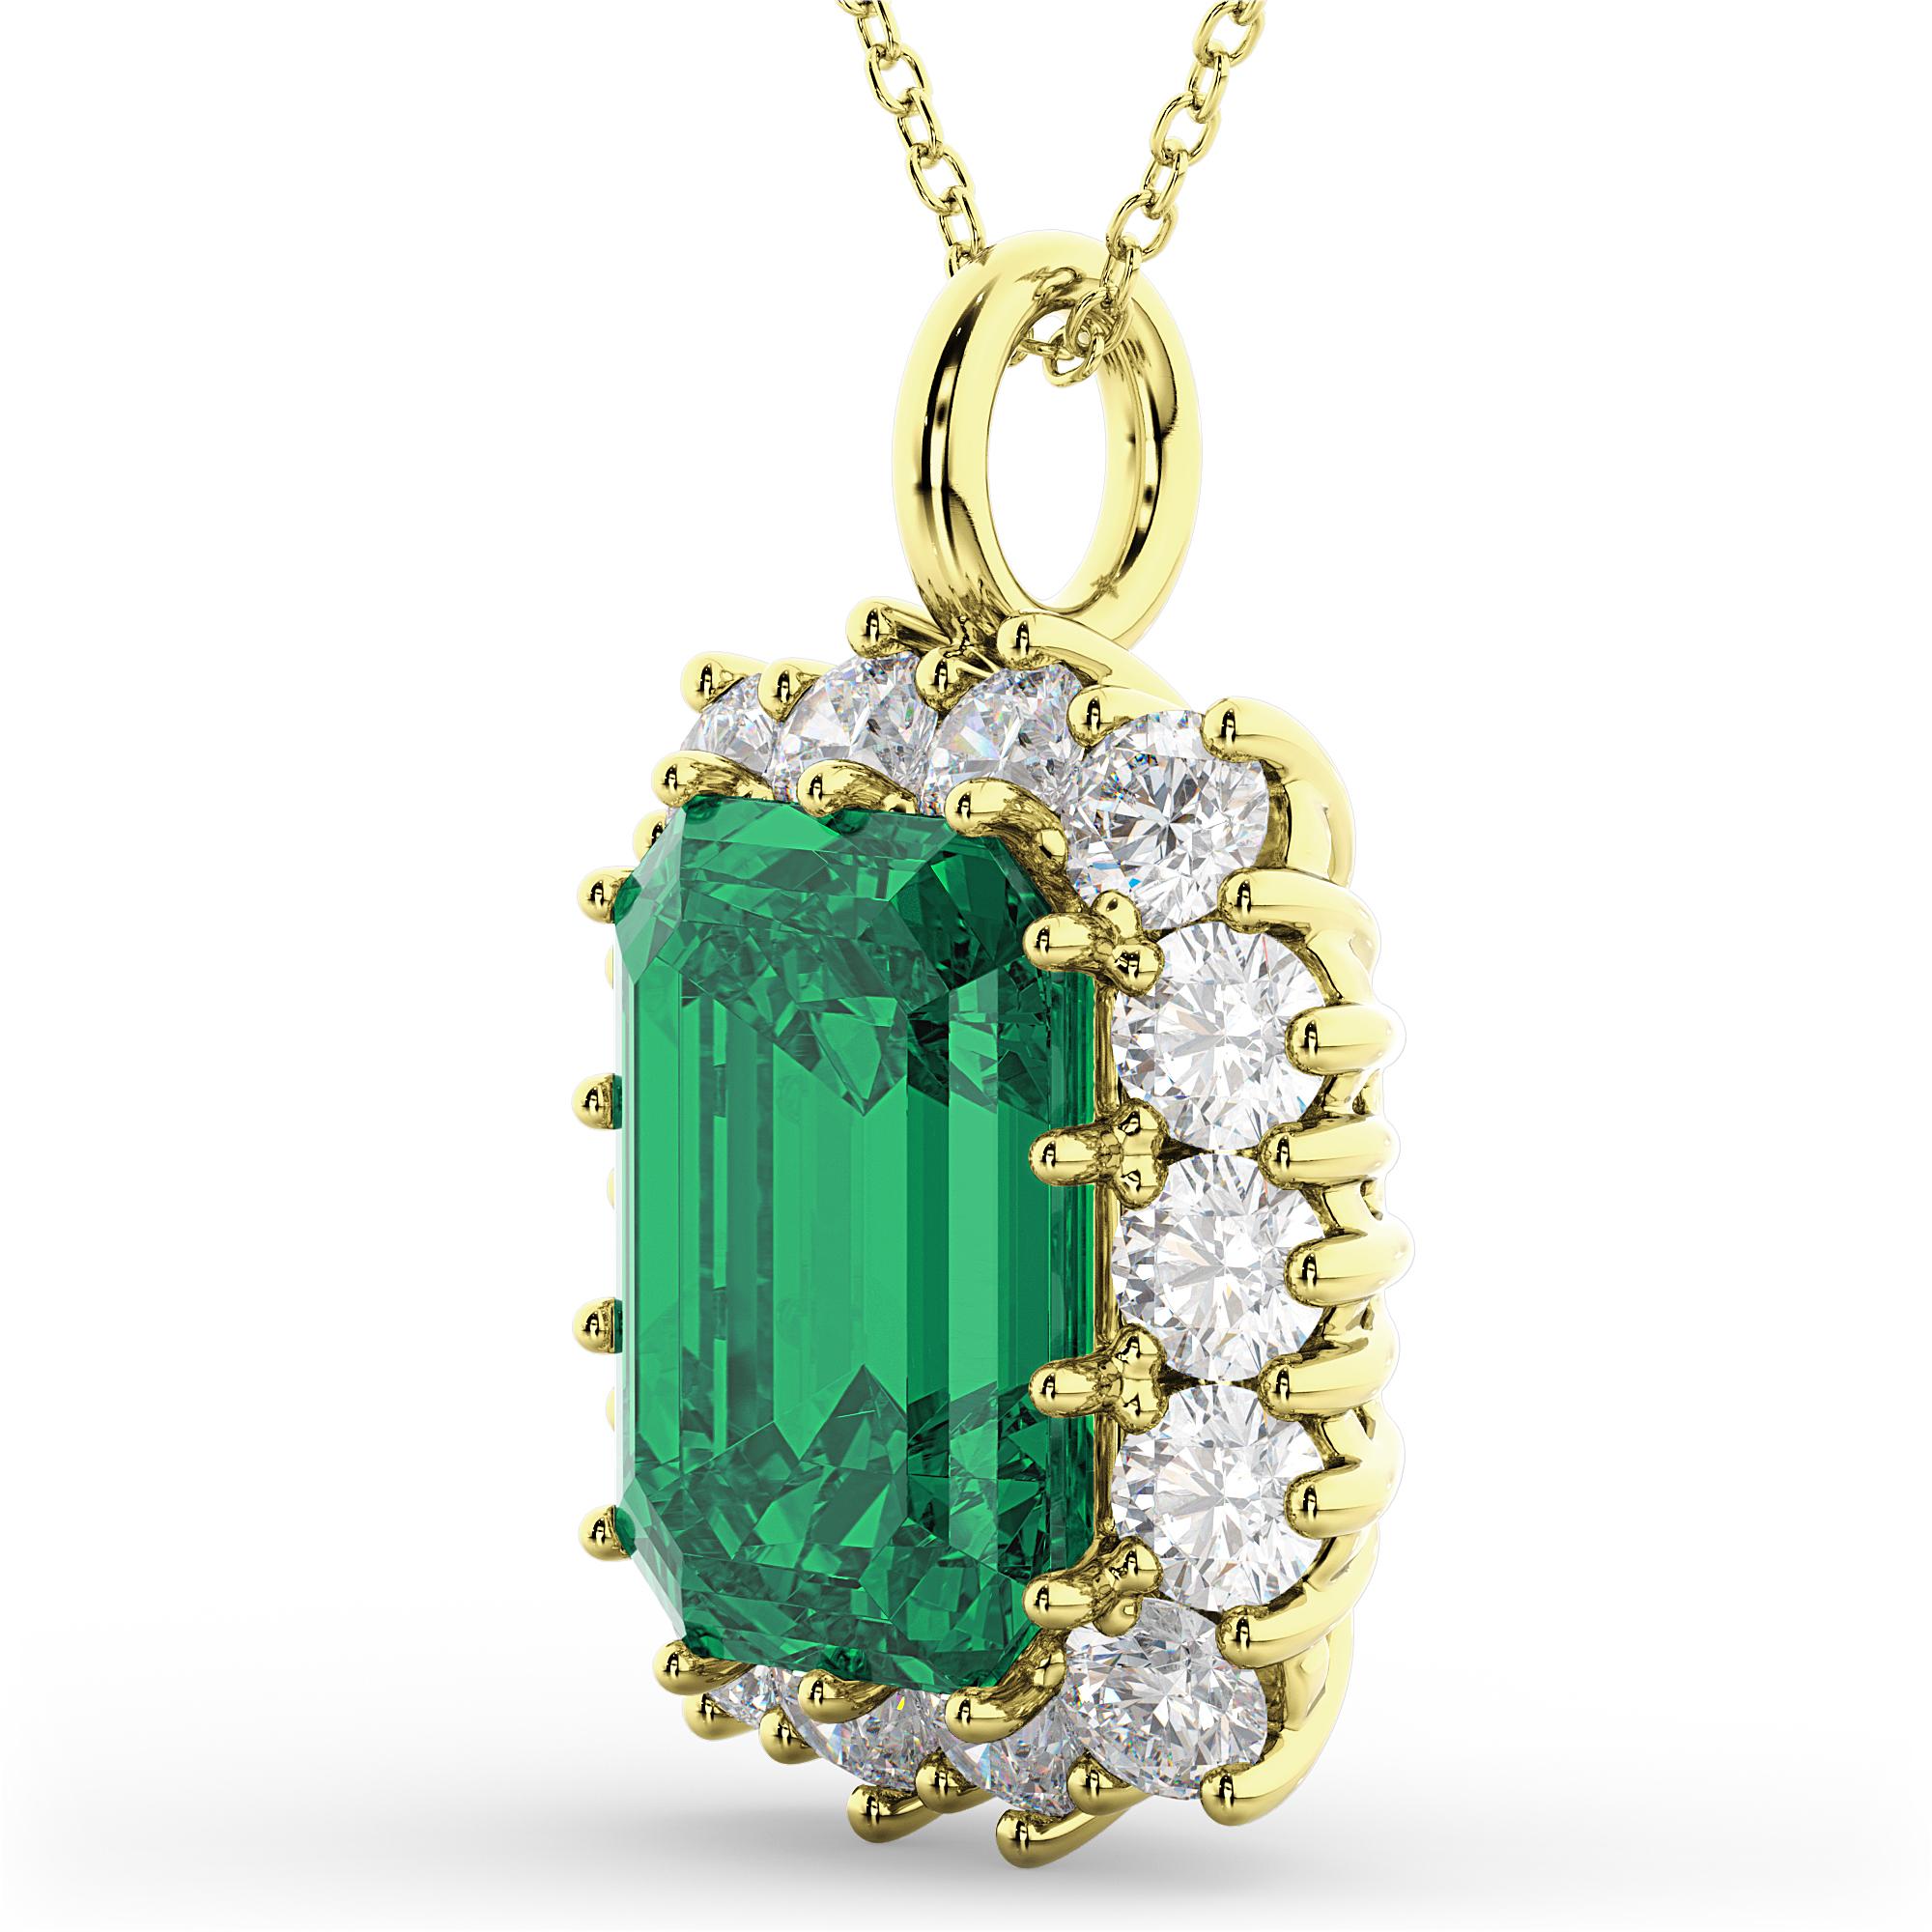 Emerald Cut Emerald & Diamond Pendant 14k Yellow Gold 5. Two Tone Bracelet. Breast Cancer Pendant. Wrap Bracelet. Emerald Cut Emerald. Unusual Engagement Rings. Enso Rings. Money Watches. Elephant Stud Earrings